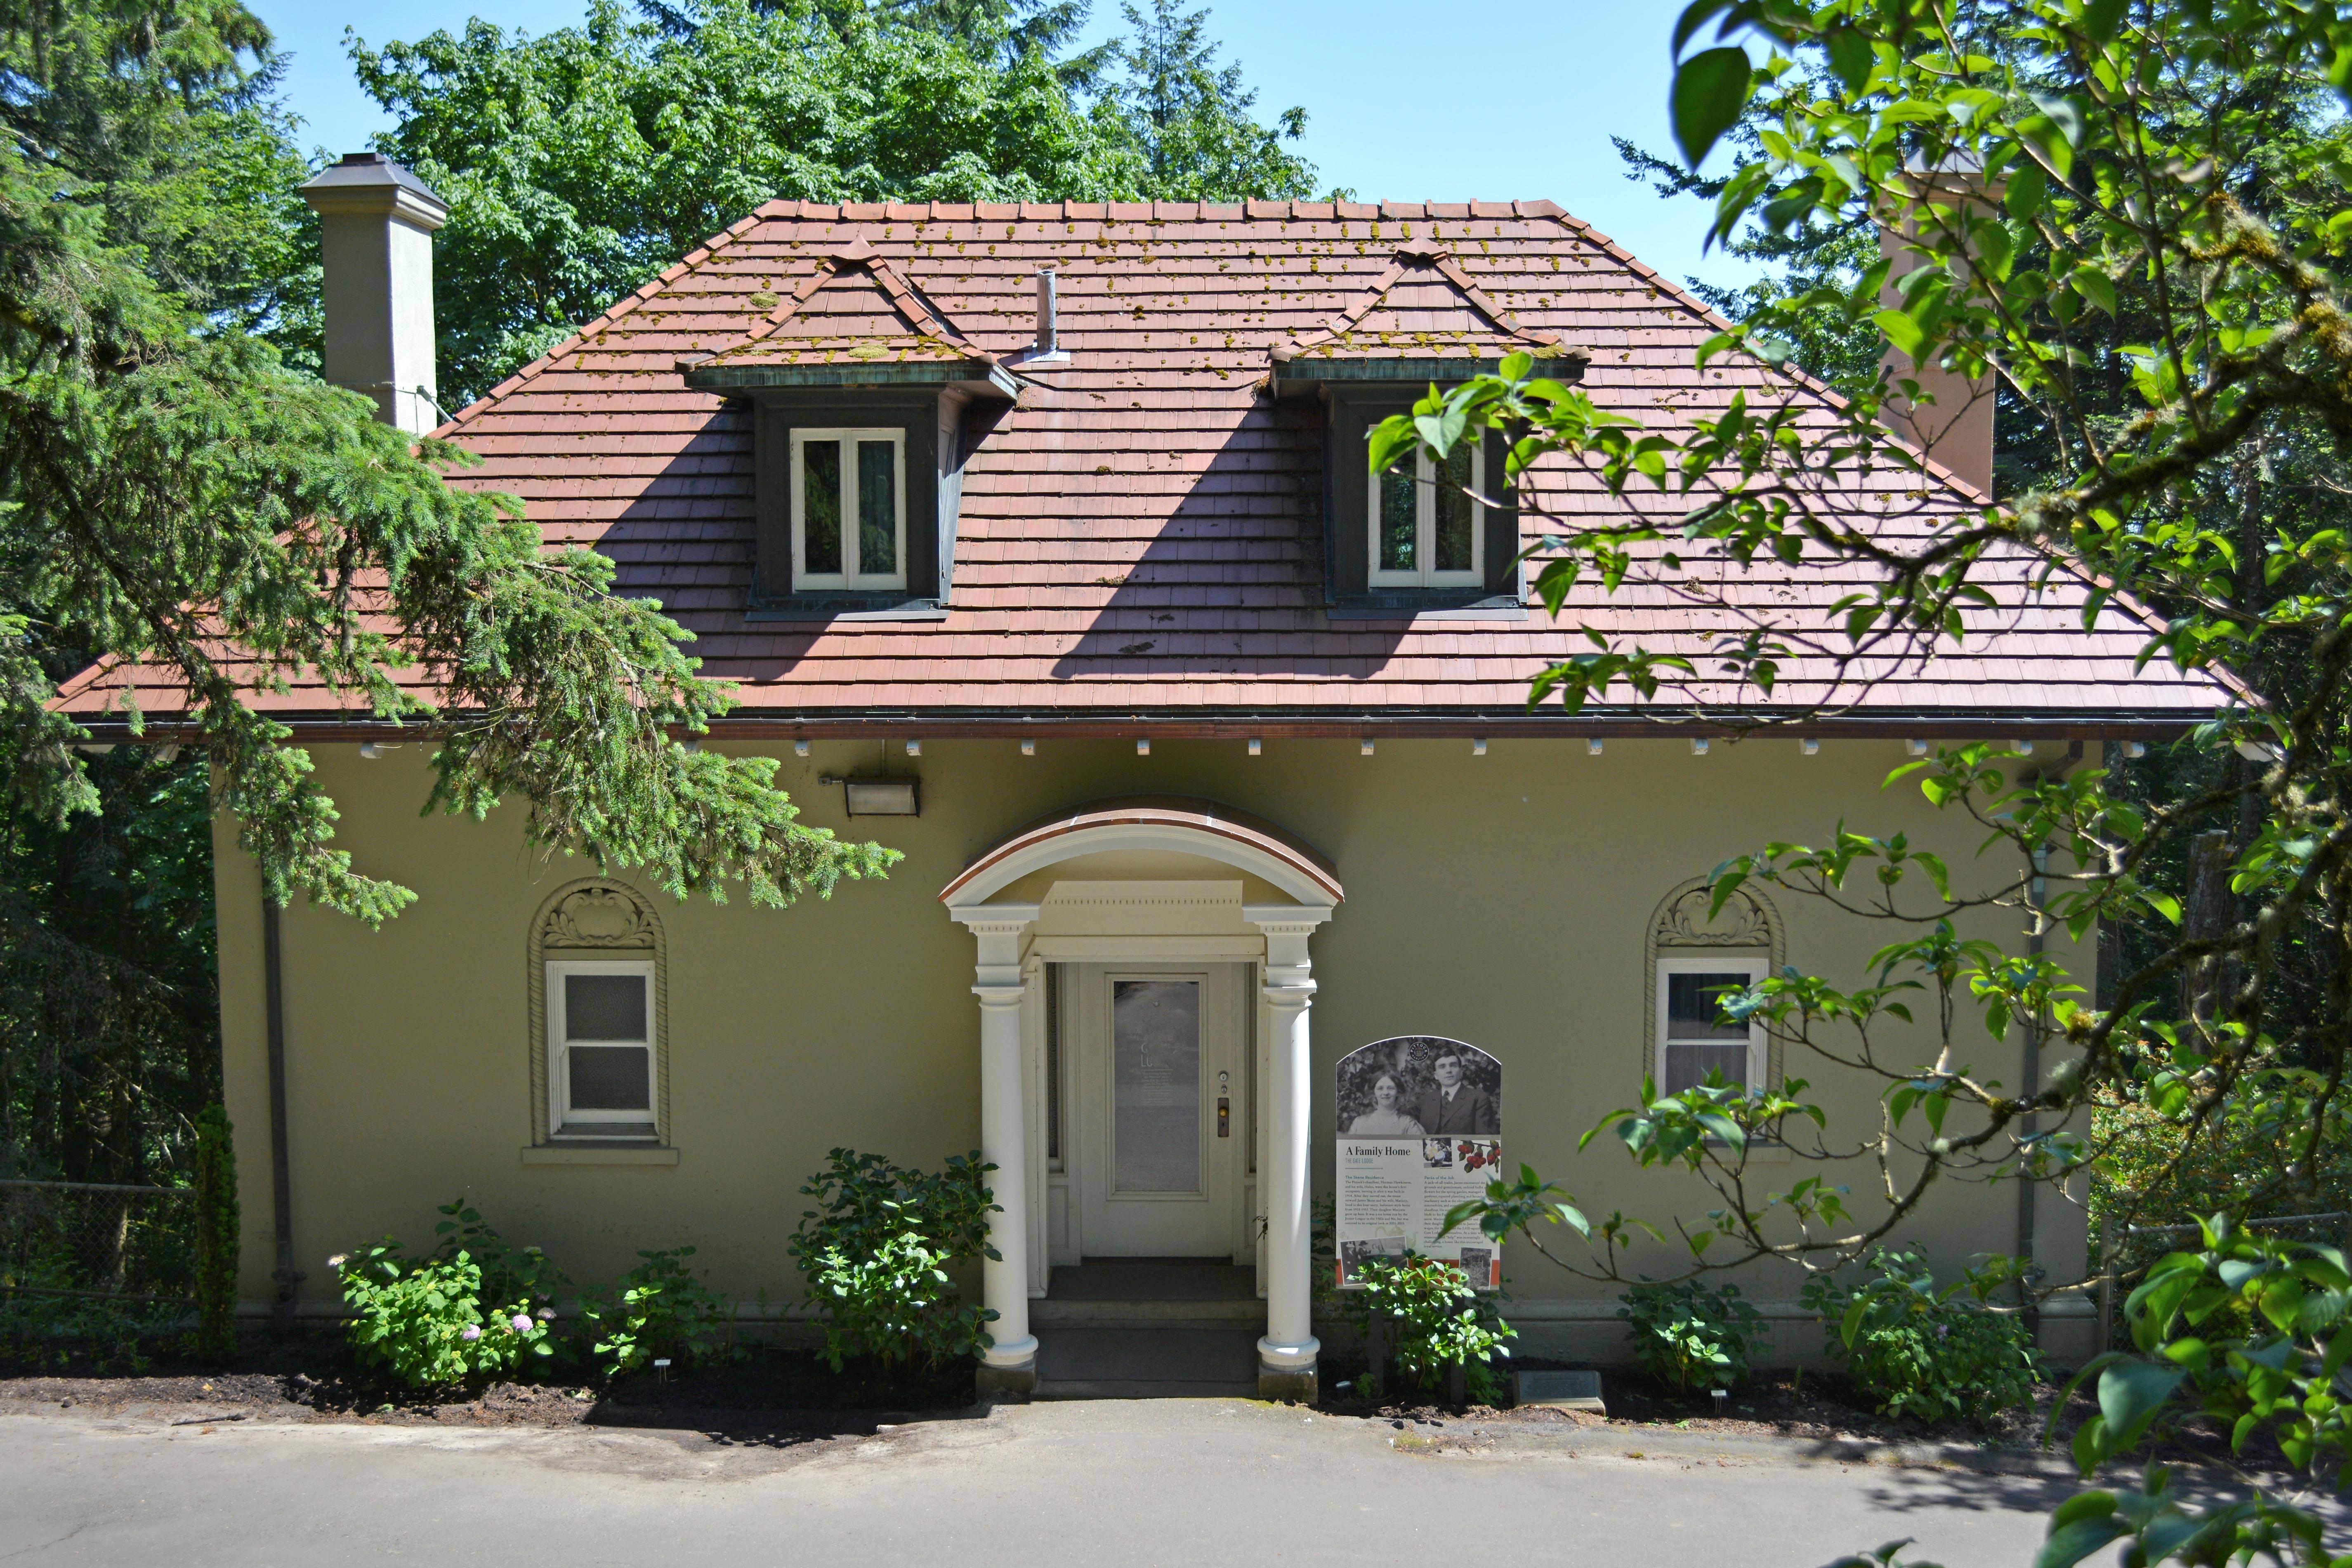 Pittock Mansion's Gate Lodge